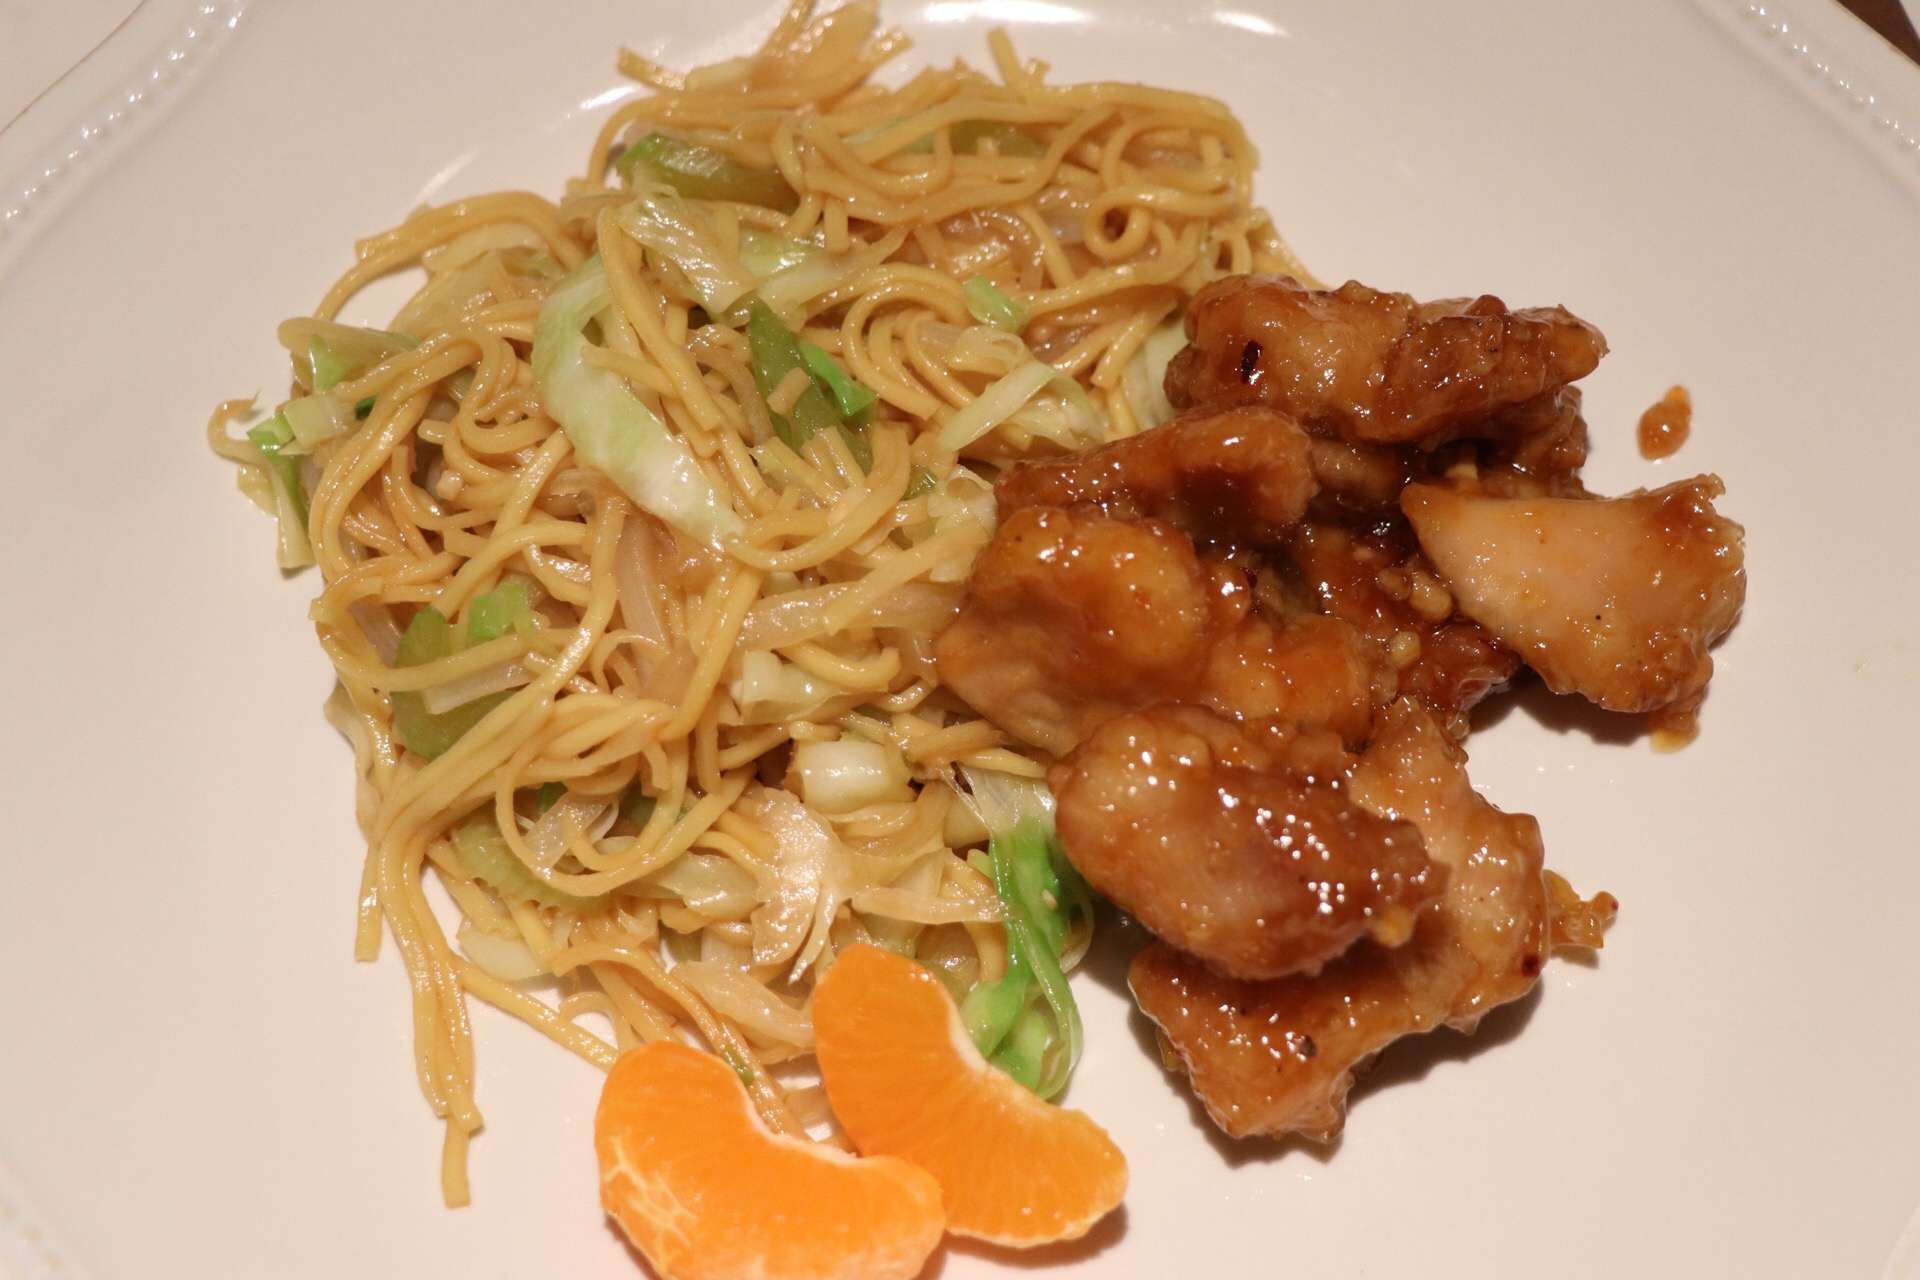 Homemade Orange Chicken and Chow Mein Recipe